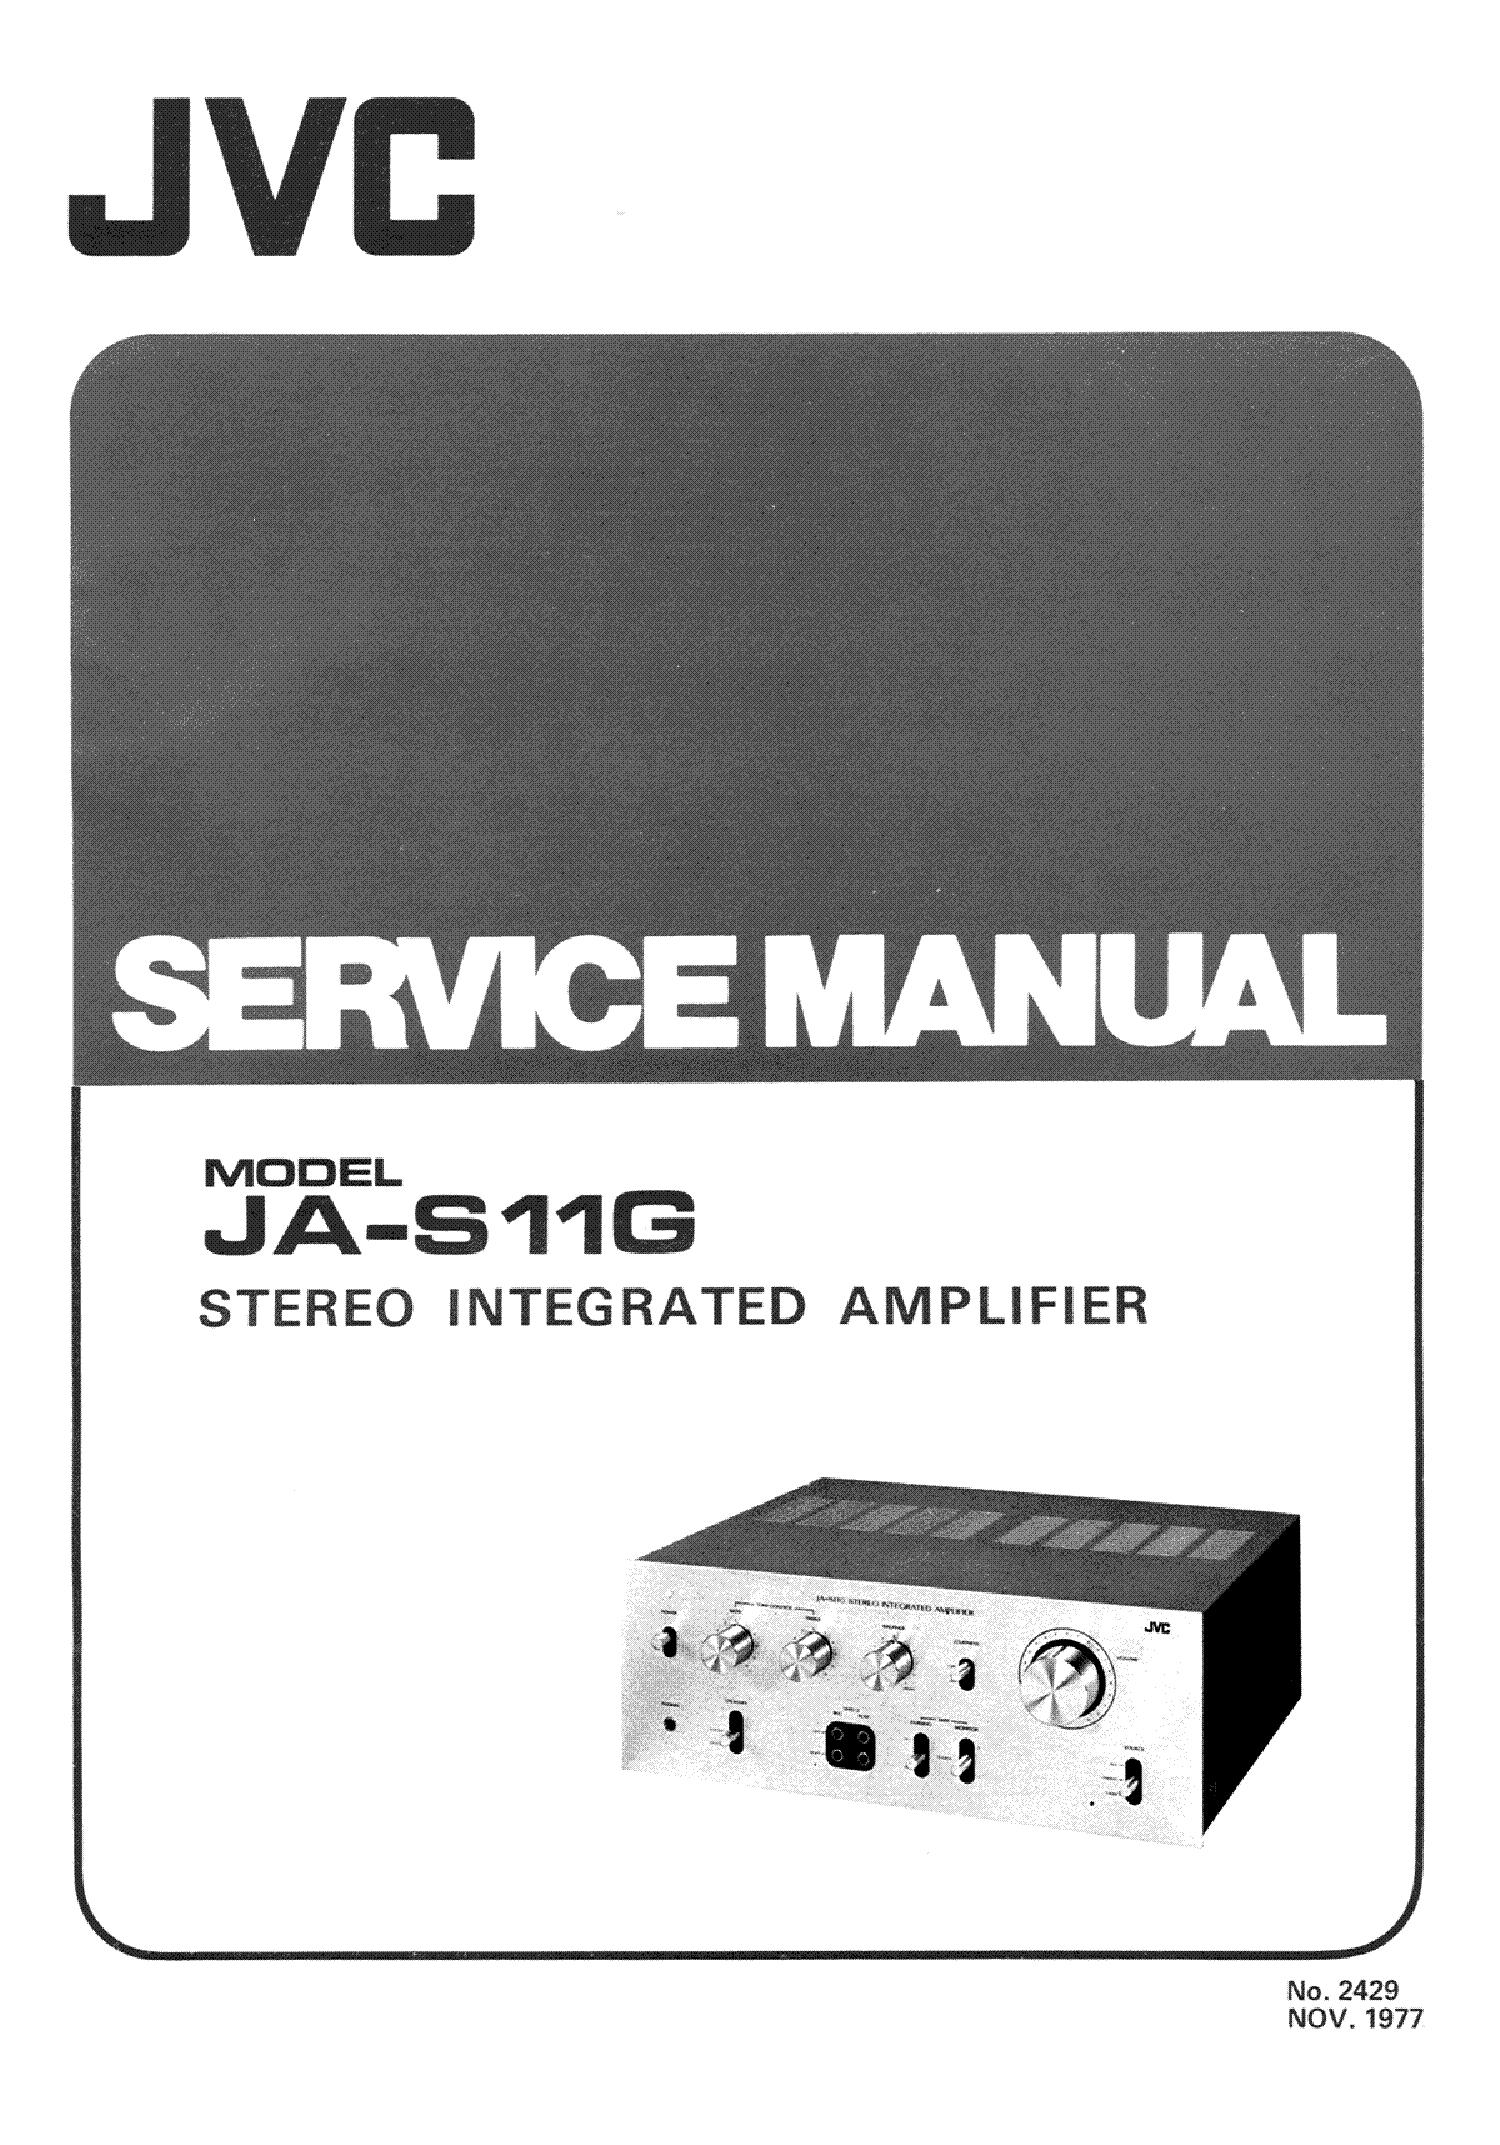 Ebook-1669] kd r926bt instruction manual jvc | 2019 ebook library.